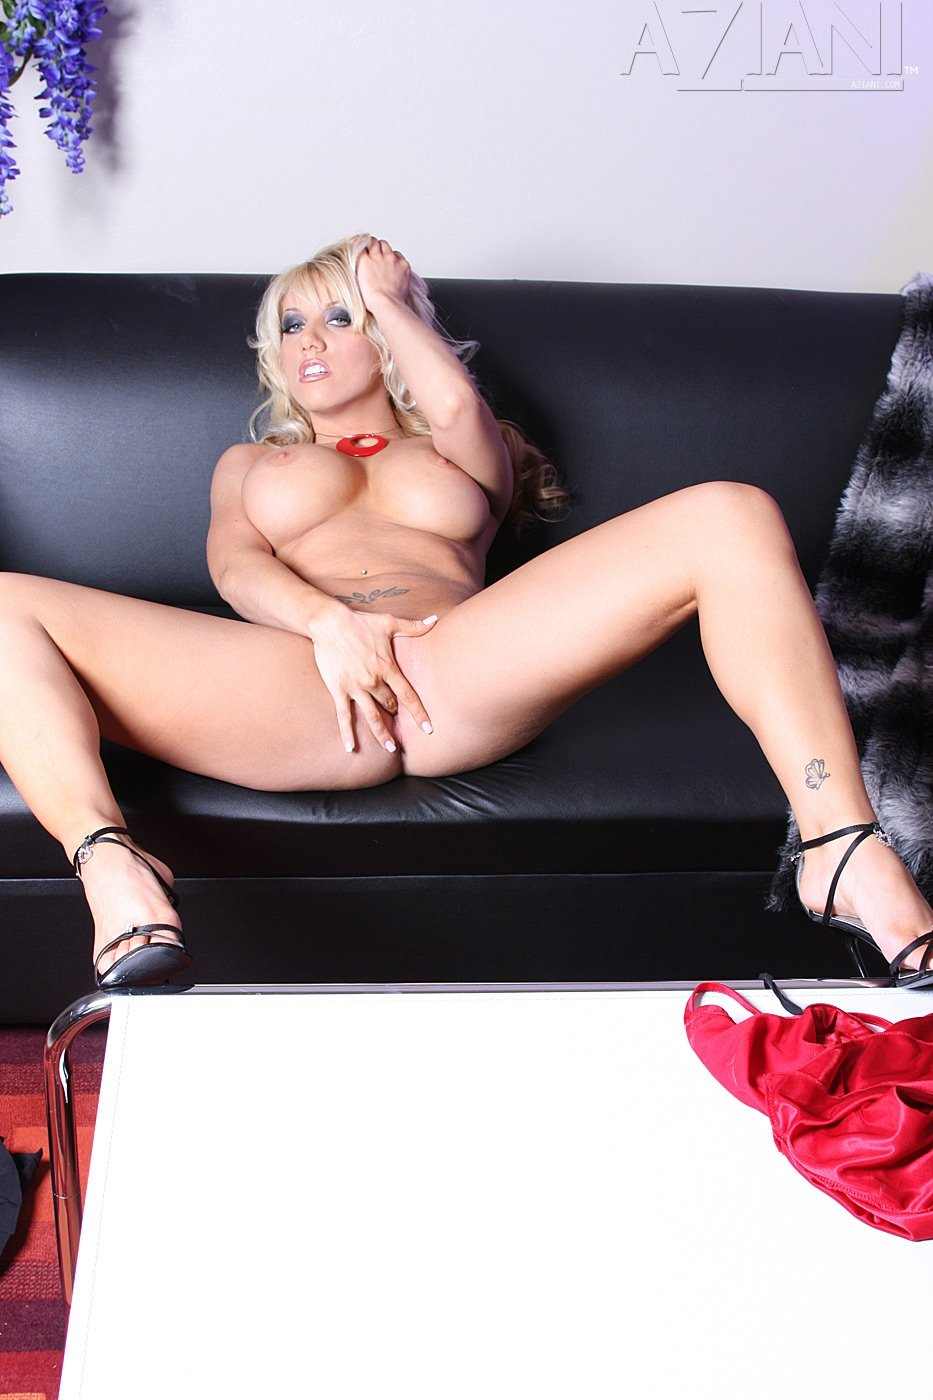 В мини юбке - Порно фото галерея 684831